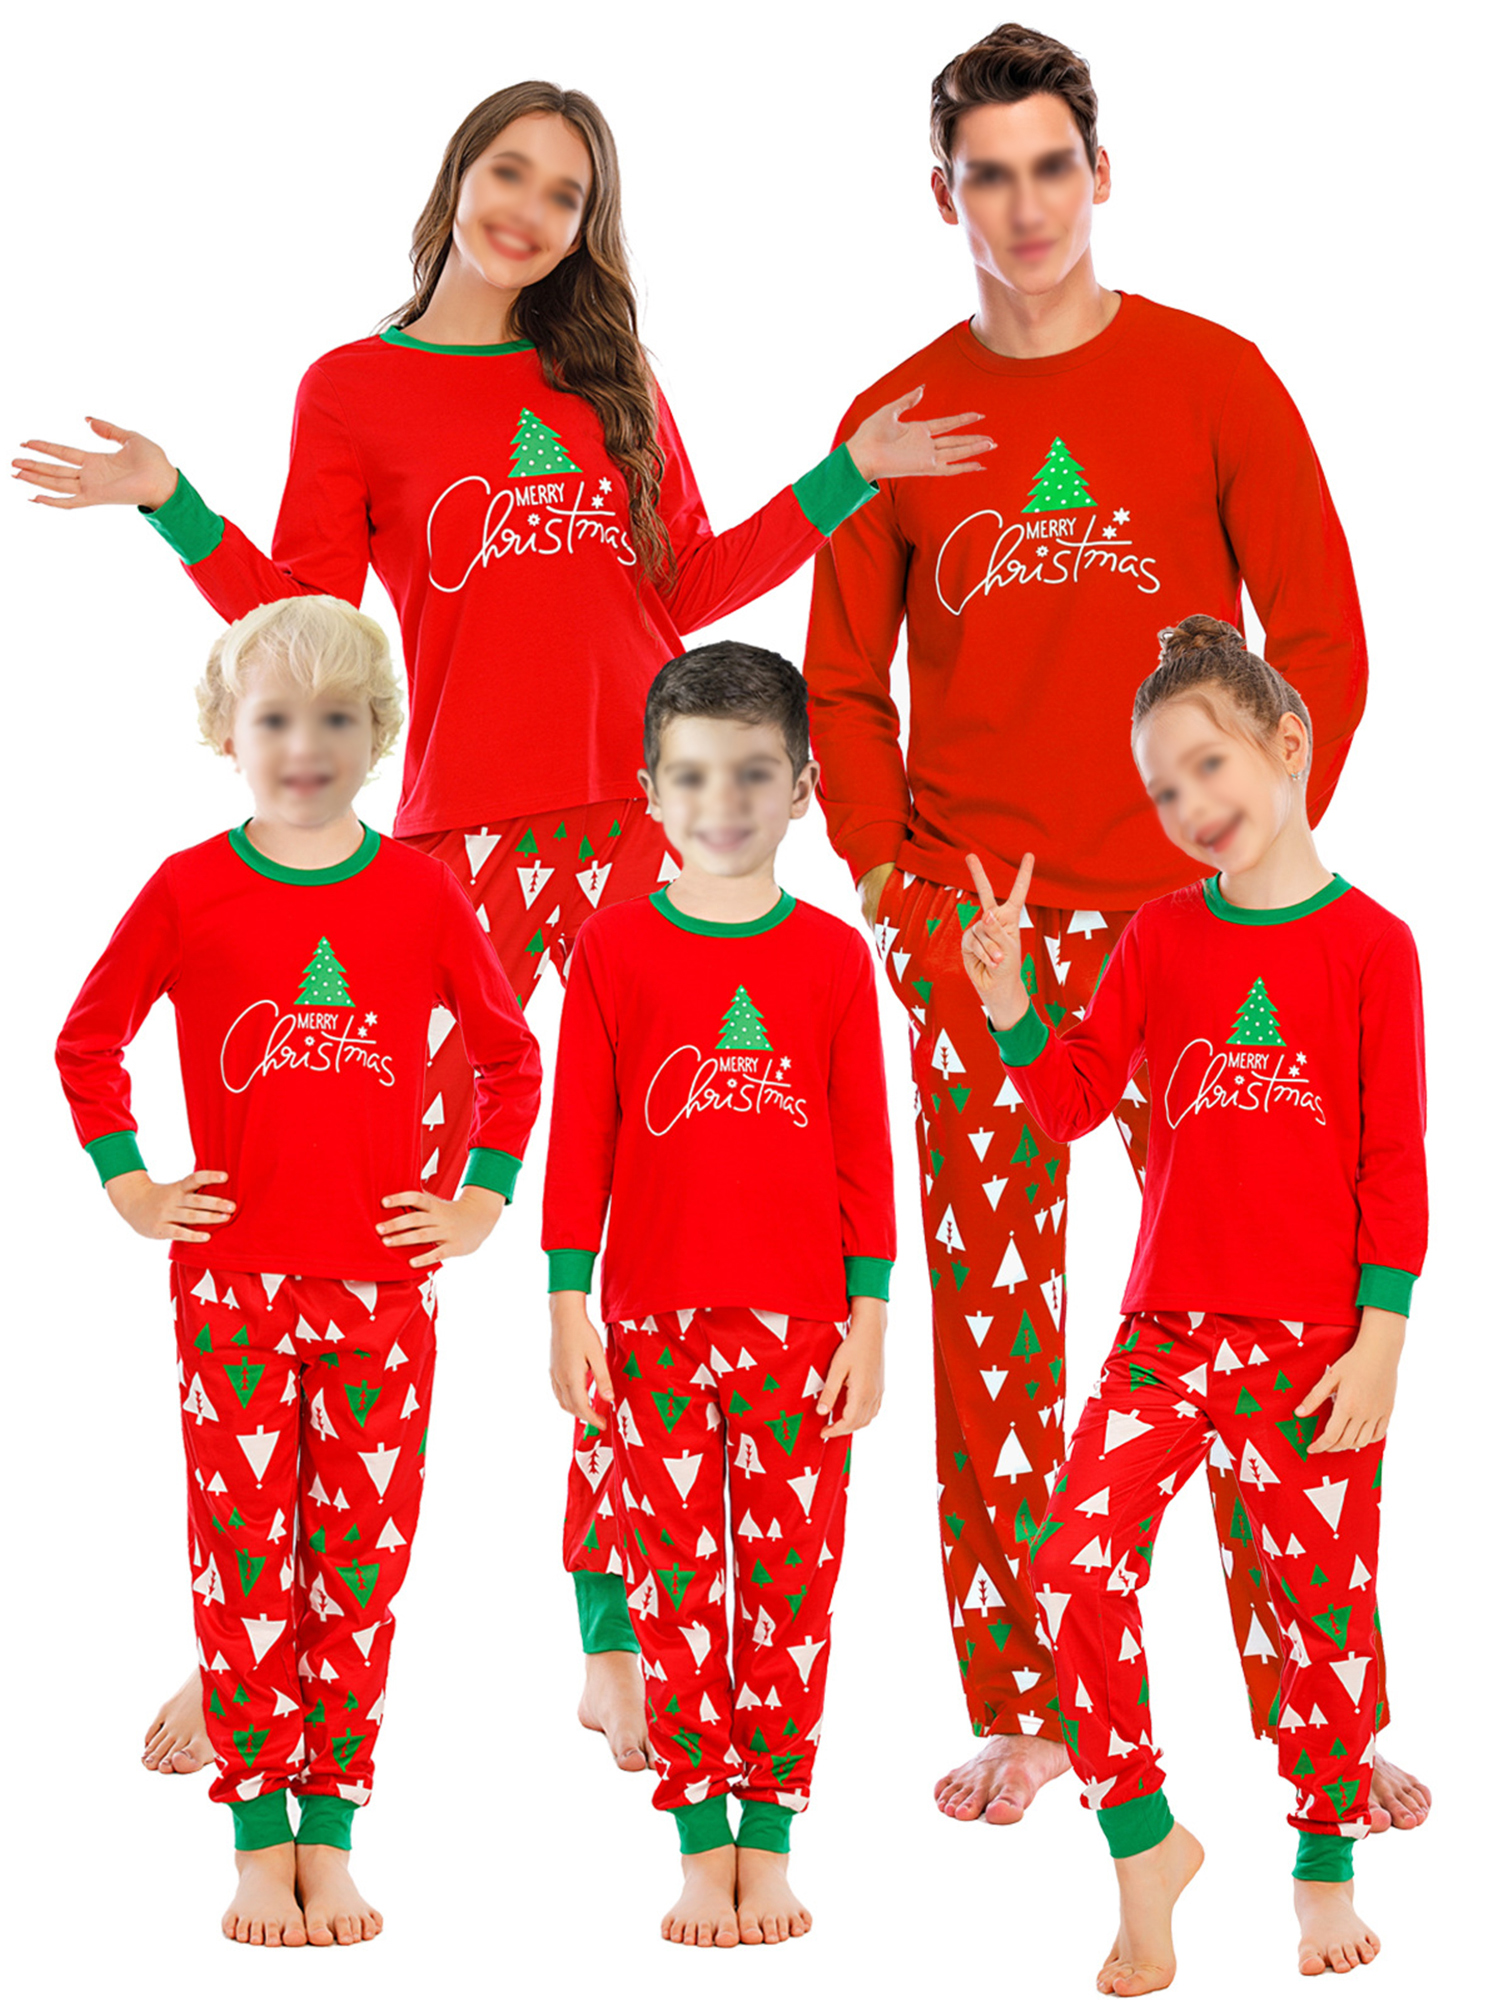 Avamo - Avamo Long Sleeve Pajamas Set Family Matching Christmas Outfits  Soft Cotton Clothes Sleepwear Night Wear Loungewear 7pcs Cozy Pjs Sets With